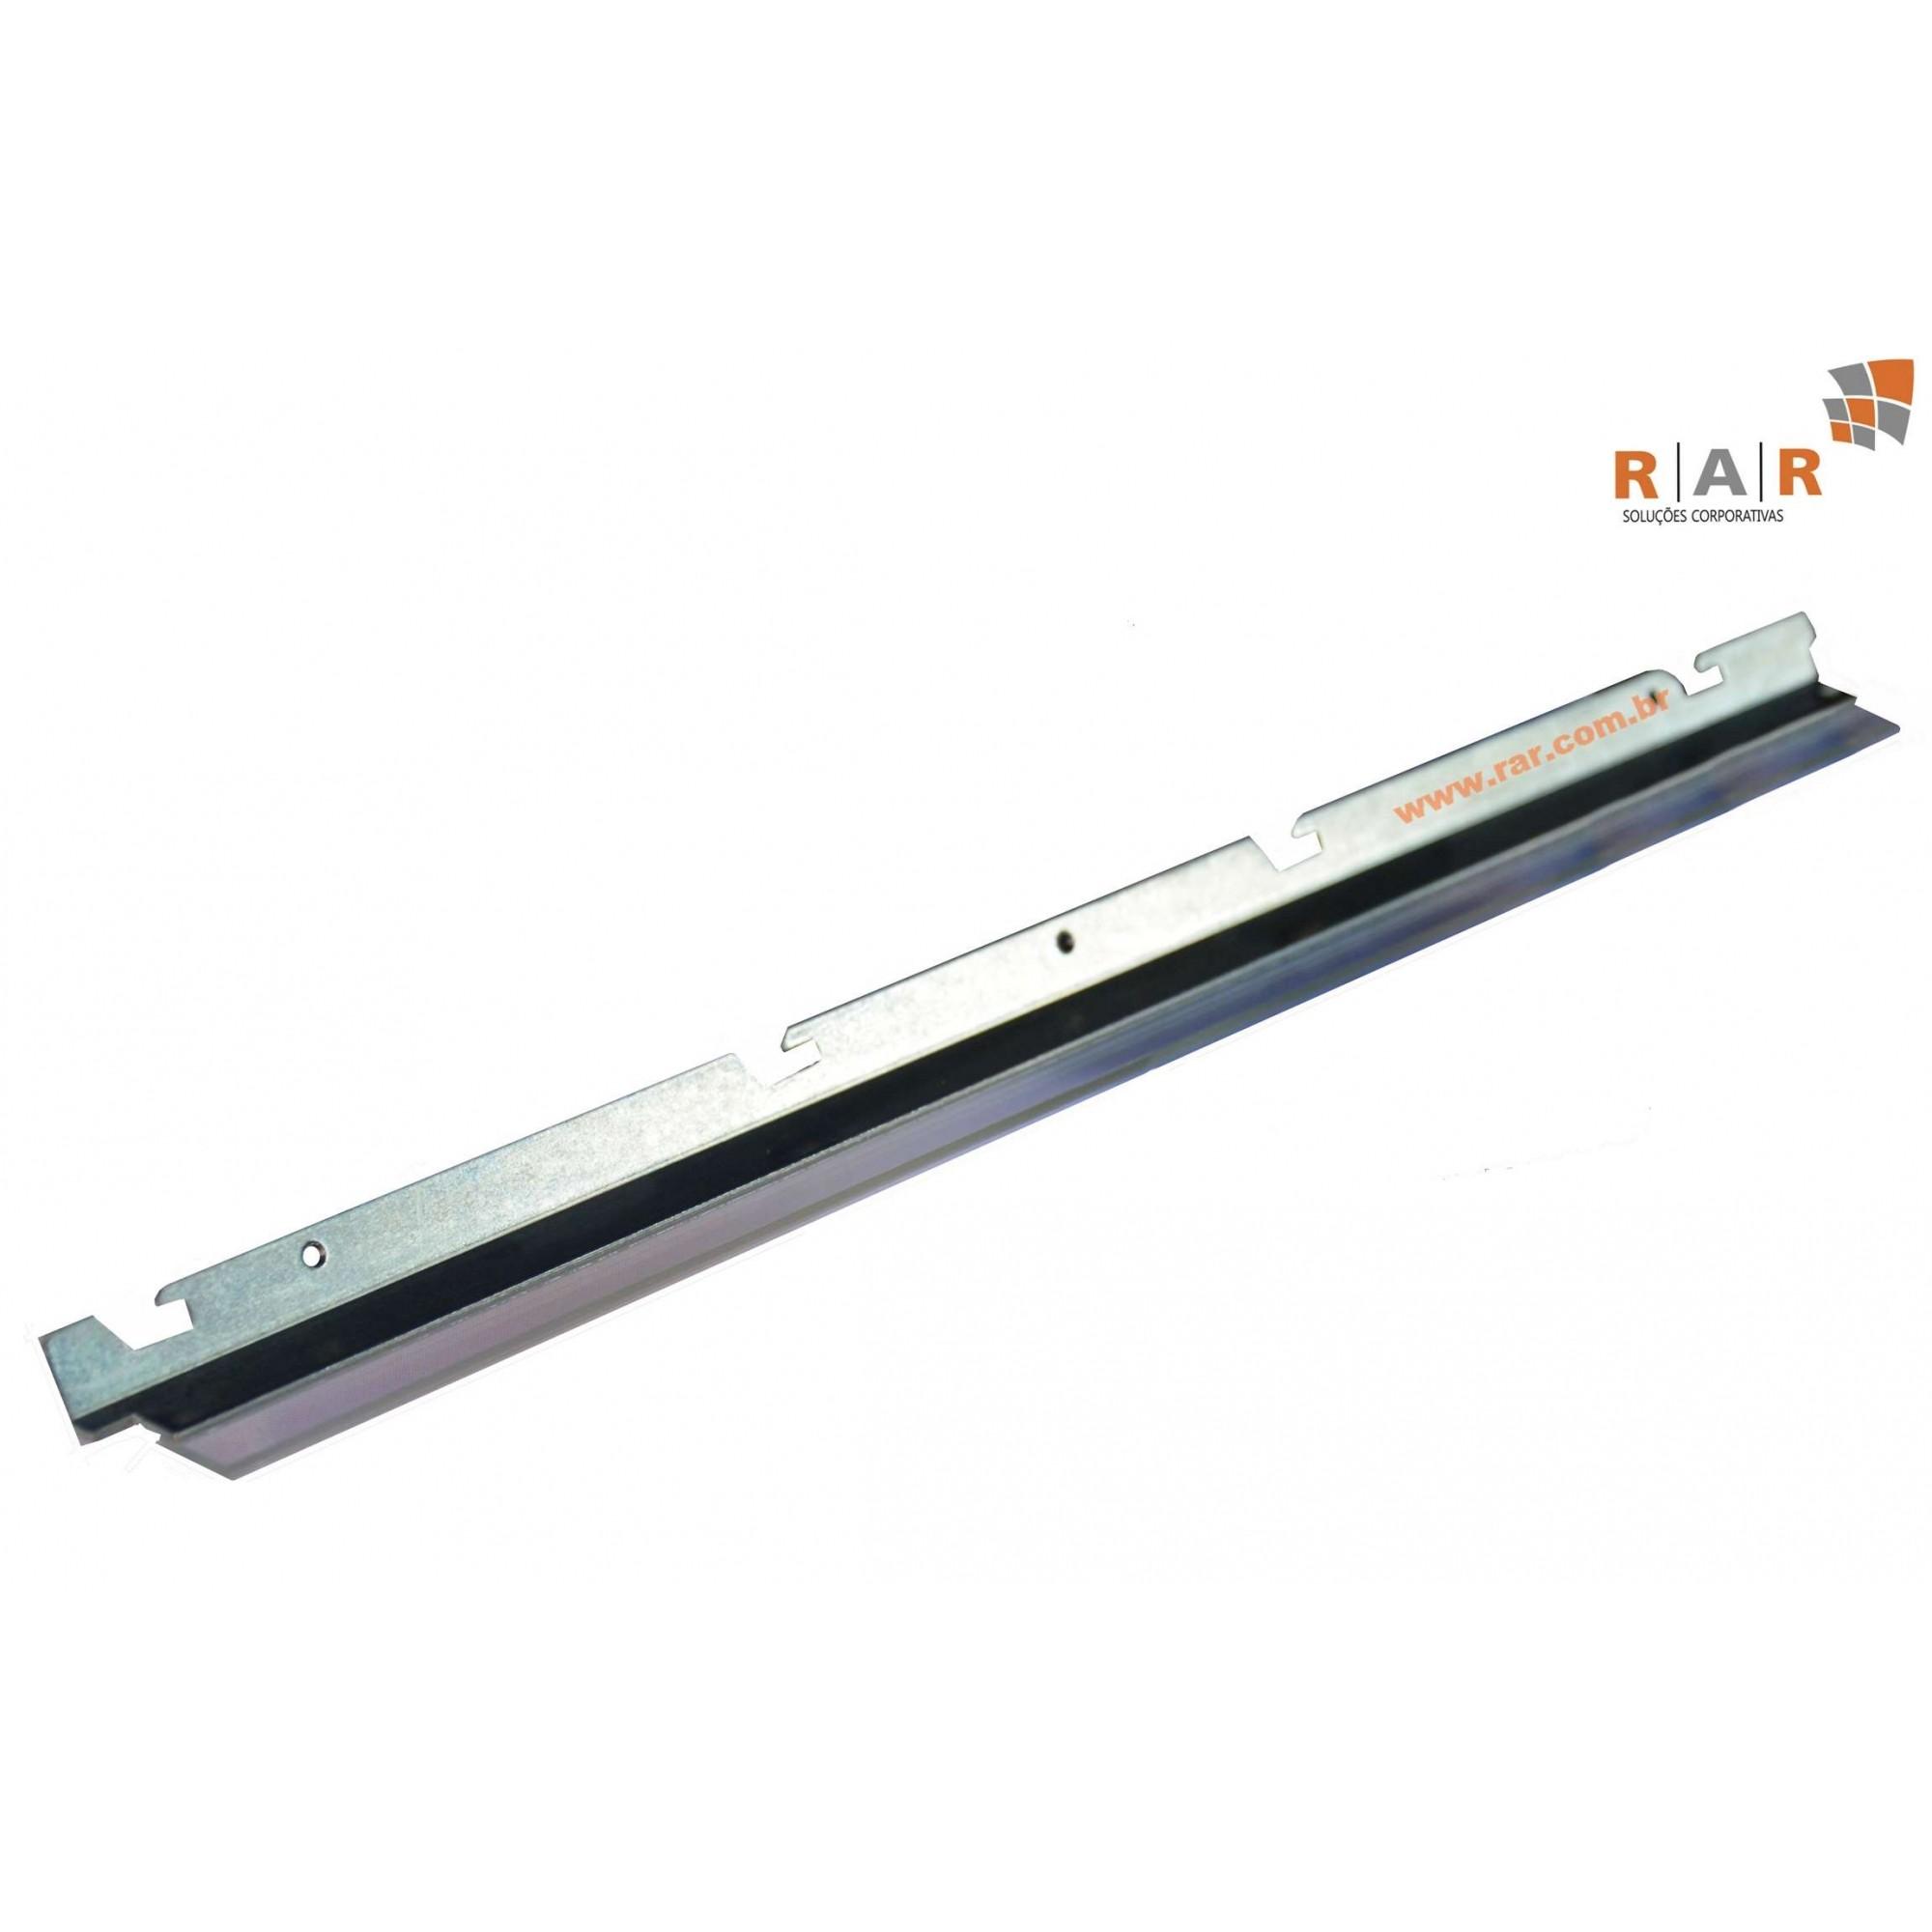 LAMINA DE LIMPEZA DO CILINDRO - CCLEZ0212FC35 - COMPATÍVEL 100% NOVA PARA SHARP MX452N / MX503N E SERIES